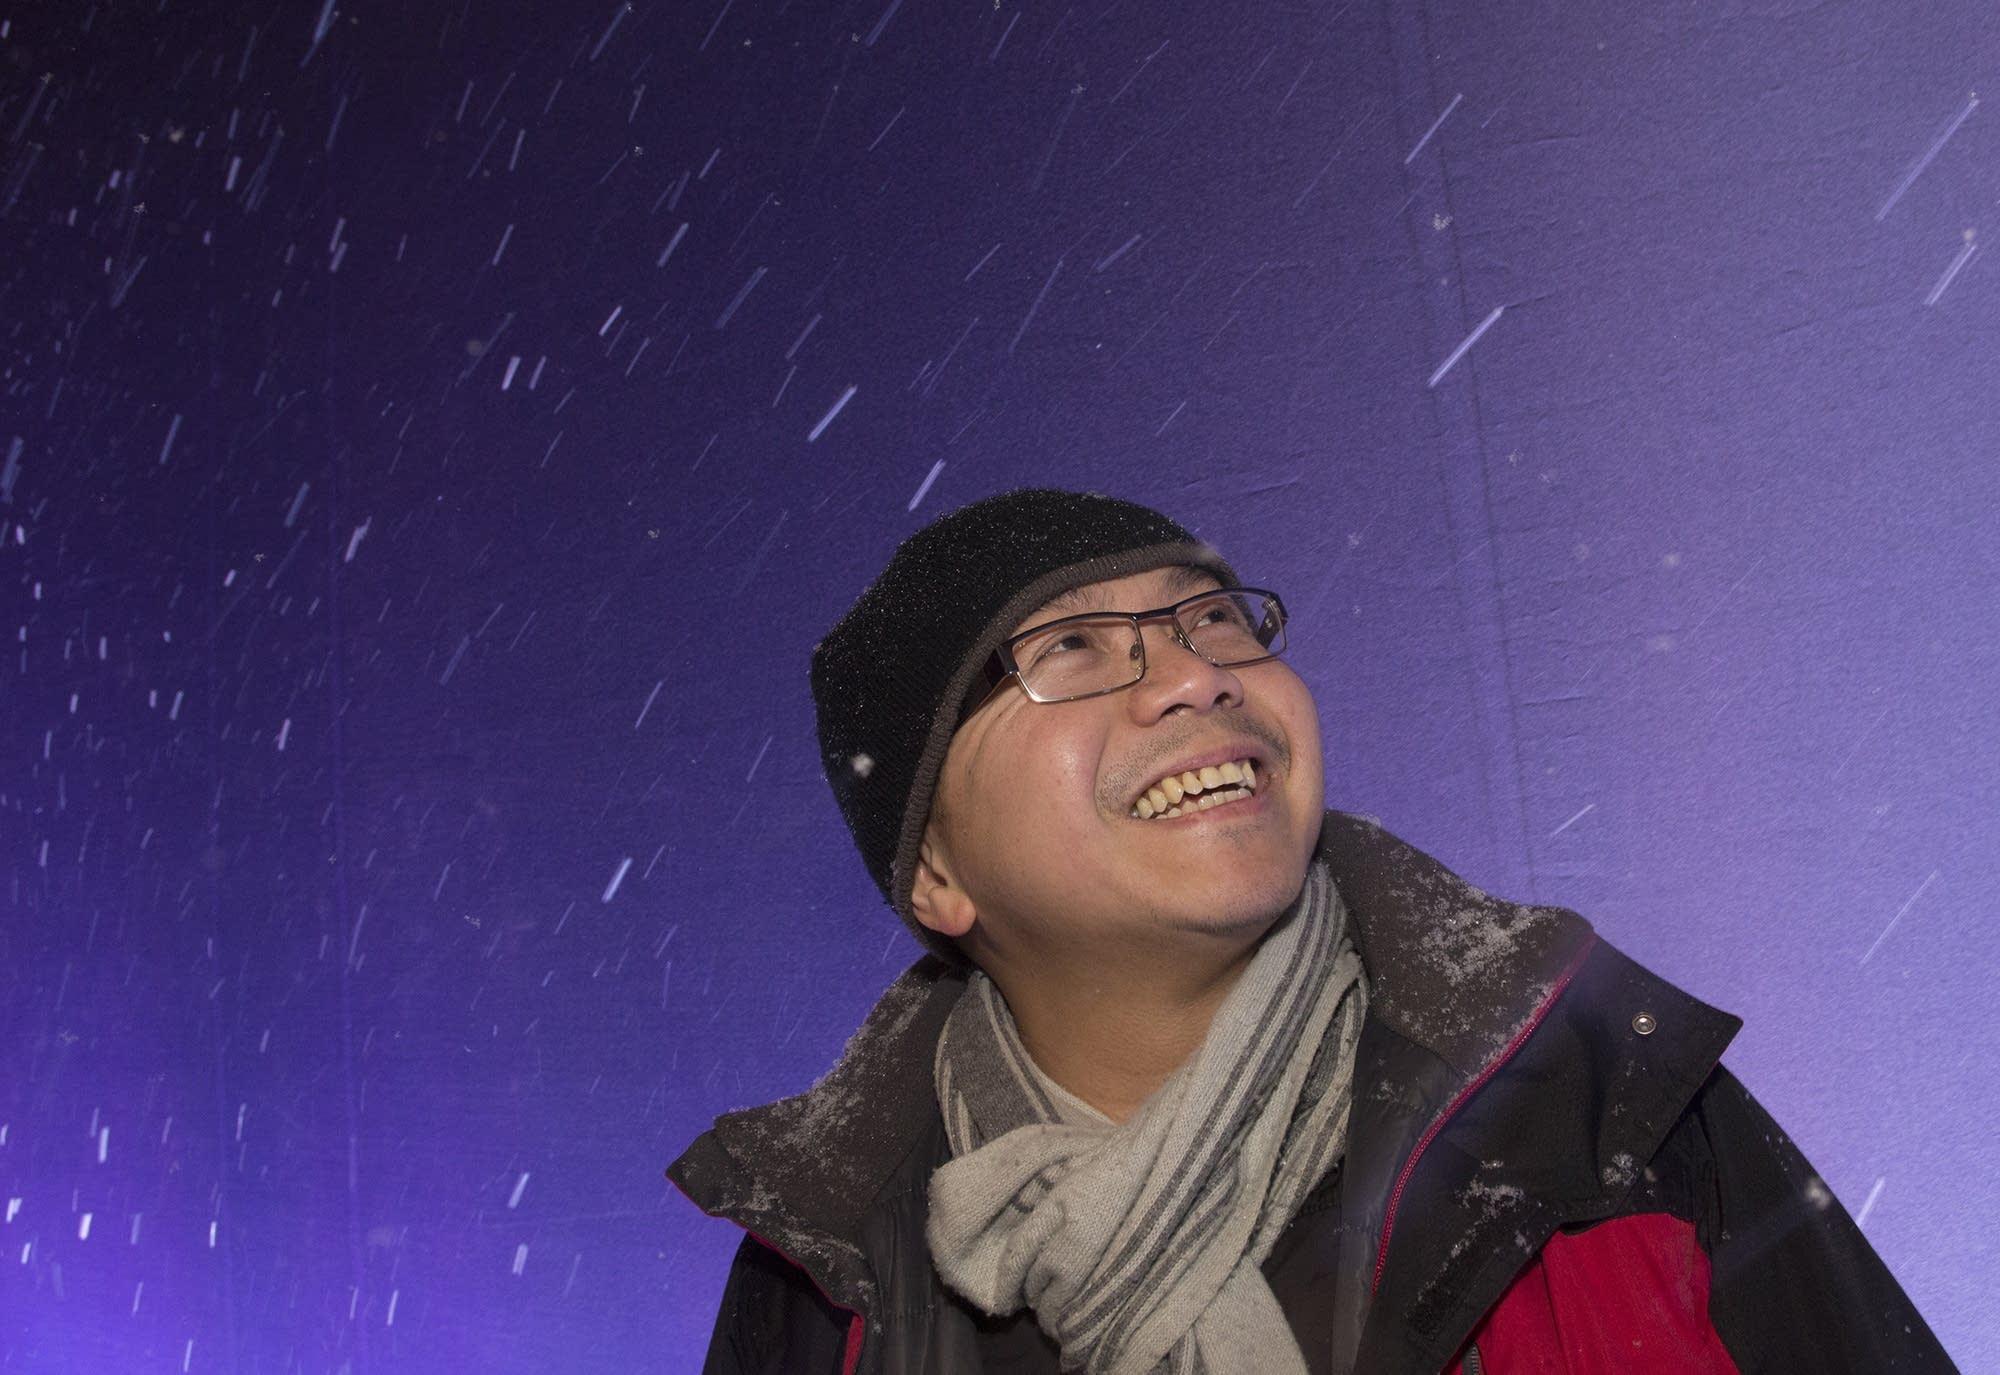 Don Do of Woodbury enjoys the snowfall on Nicollet Mall.